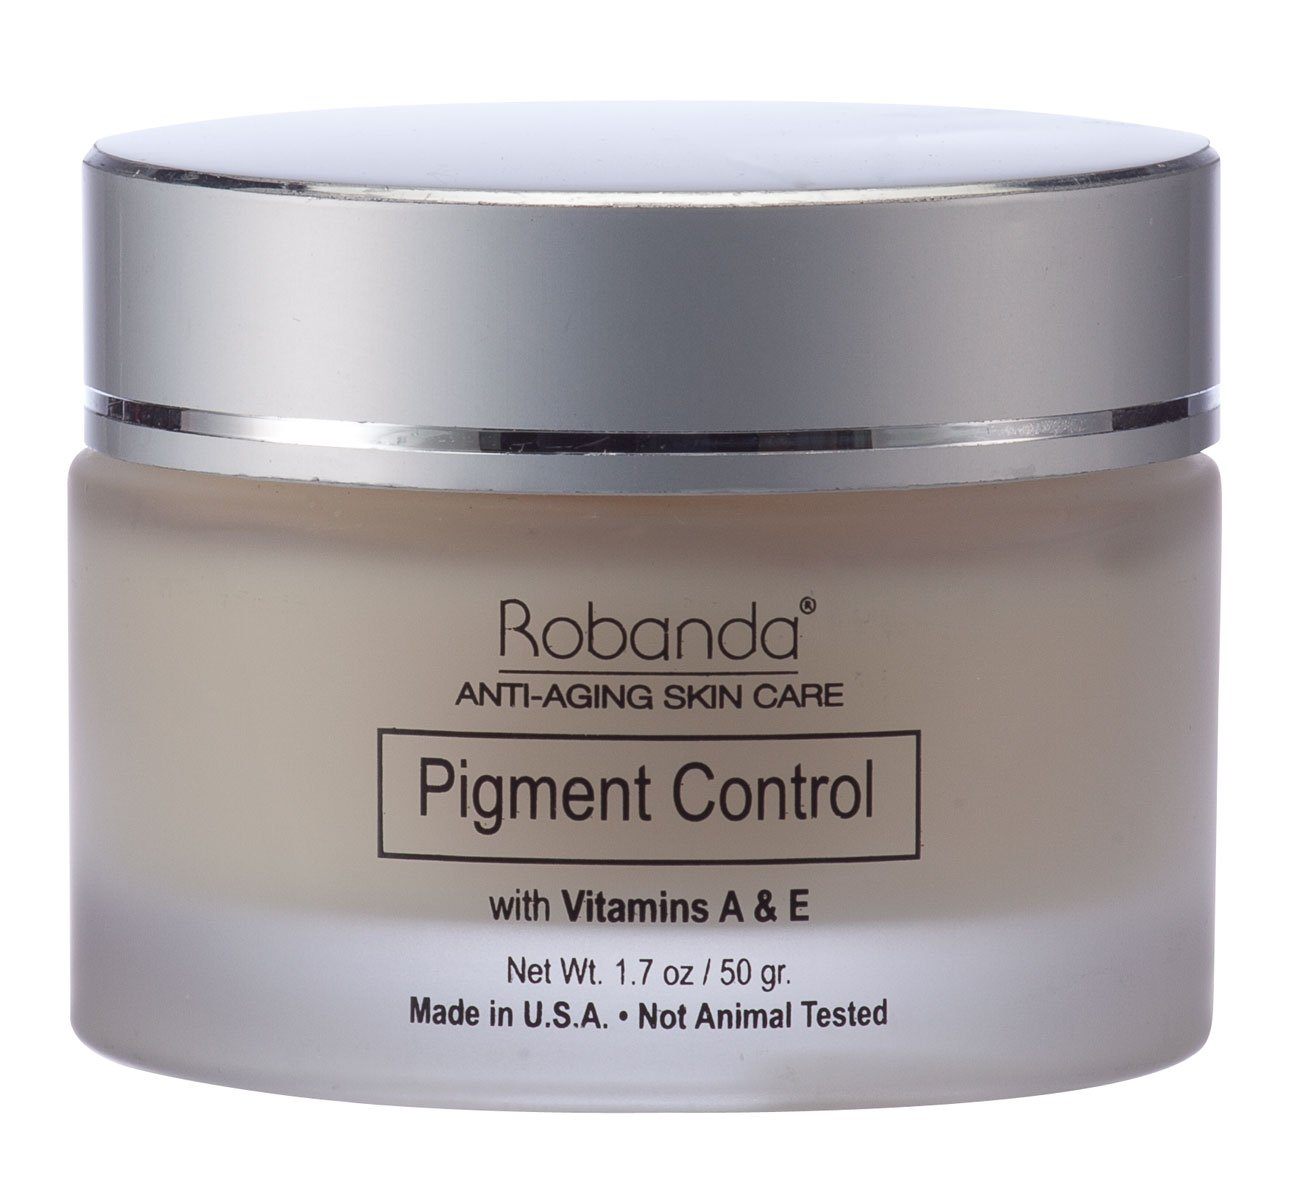 Retinol by Robanda Pigment control, 1.7 Ounce